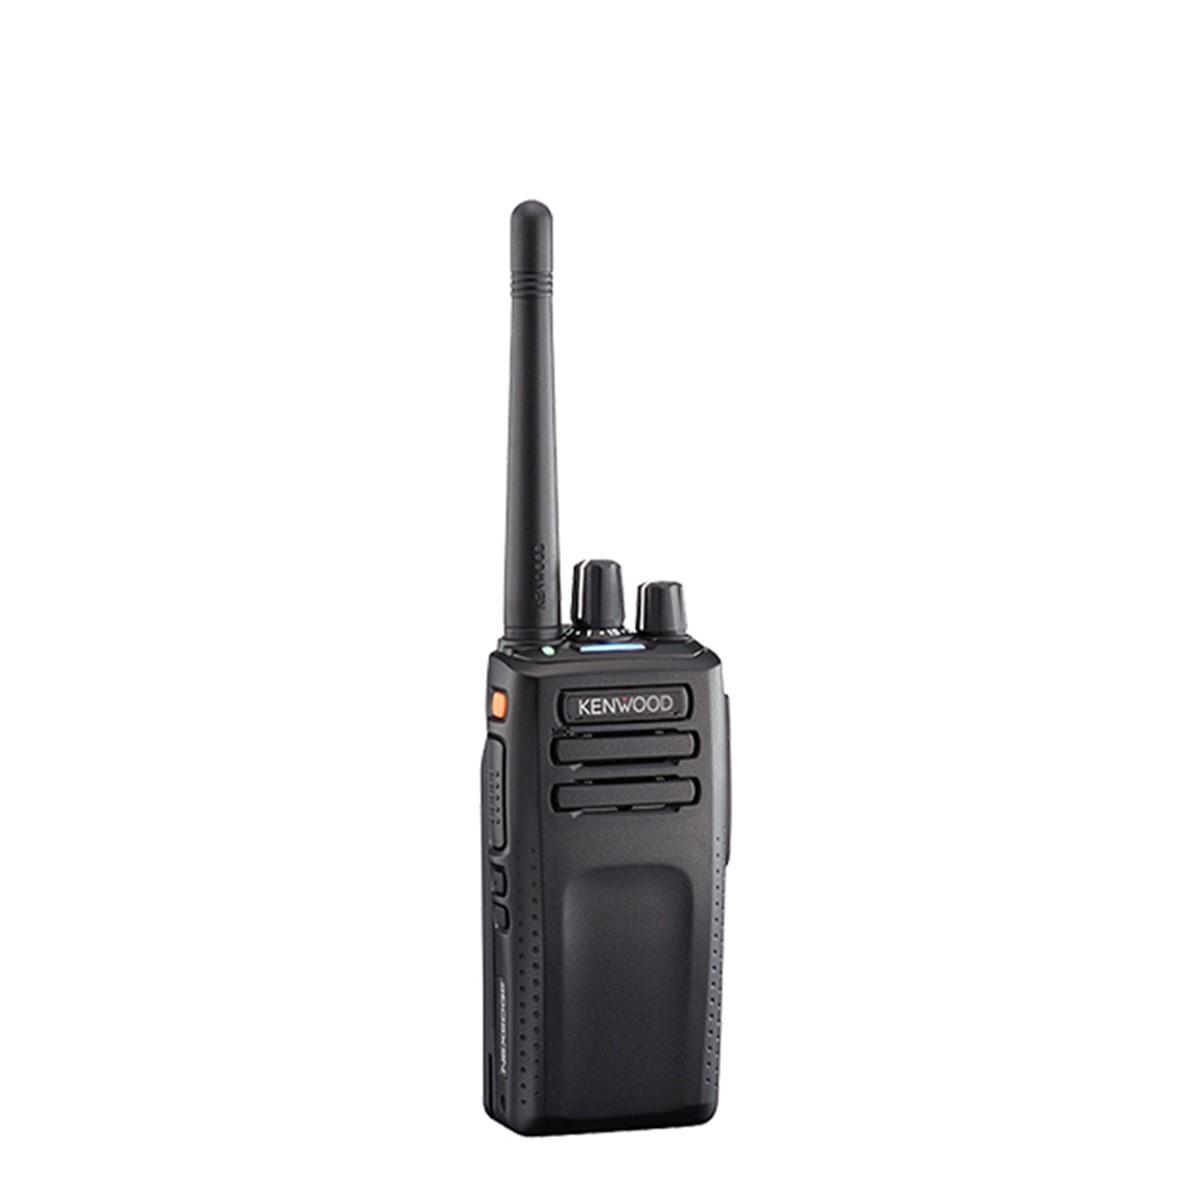 Radio KENWOOD NX-3300 Digital UHF 400-520 MHz sin pantalla y sin teclado